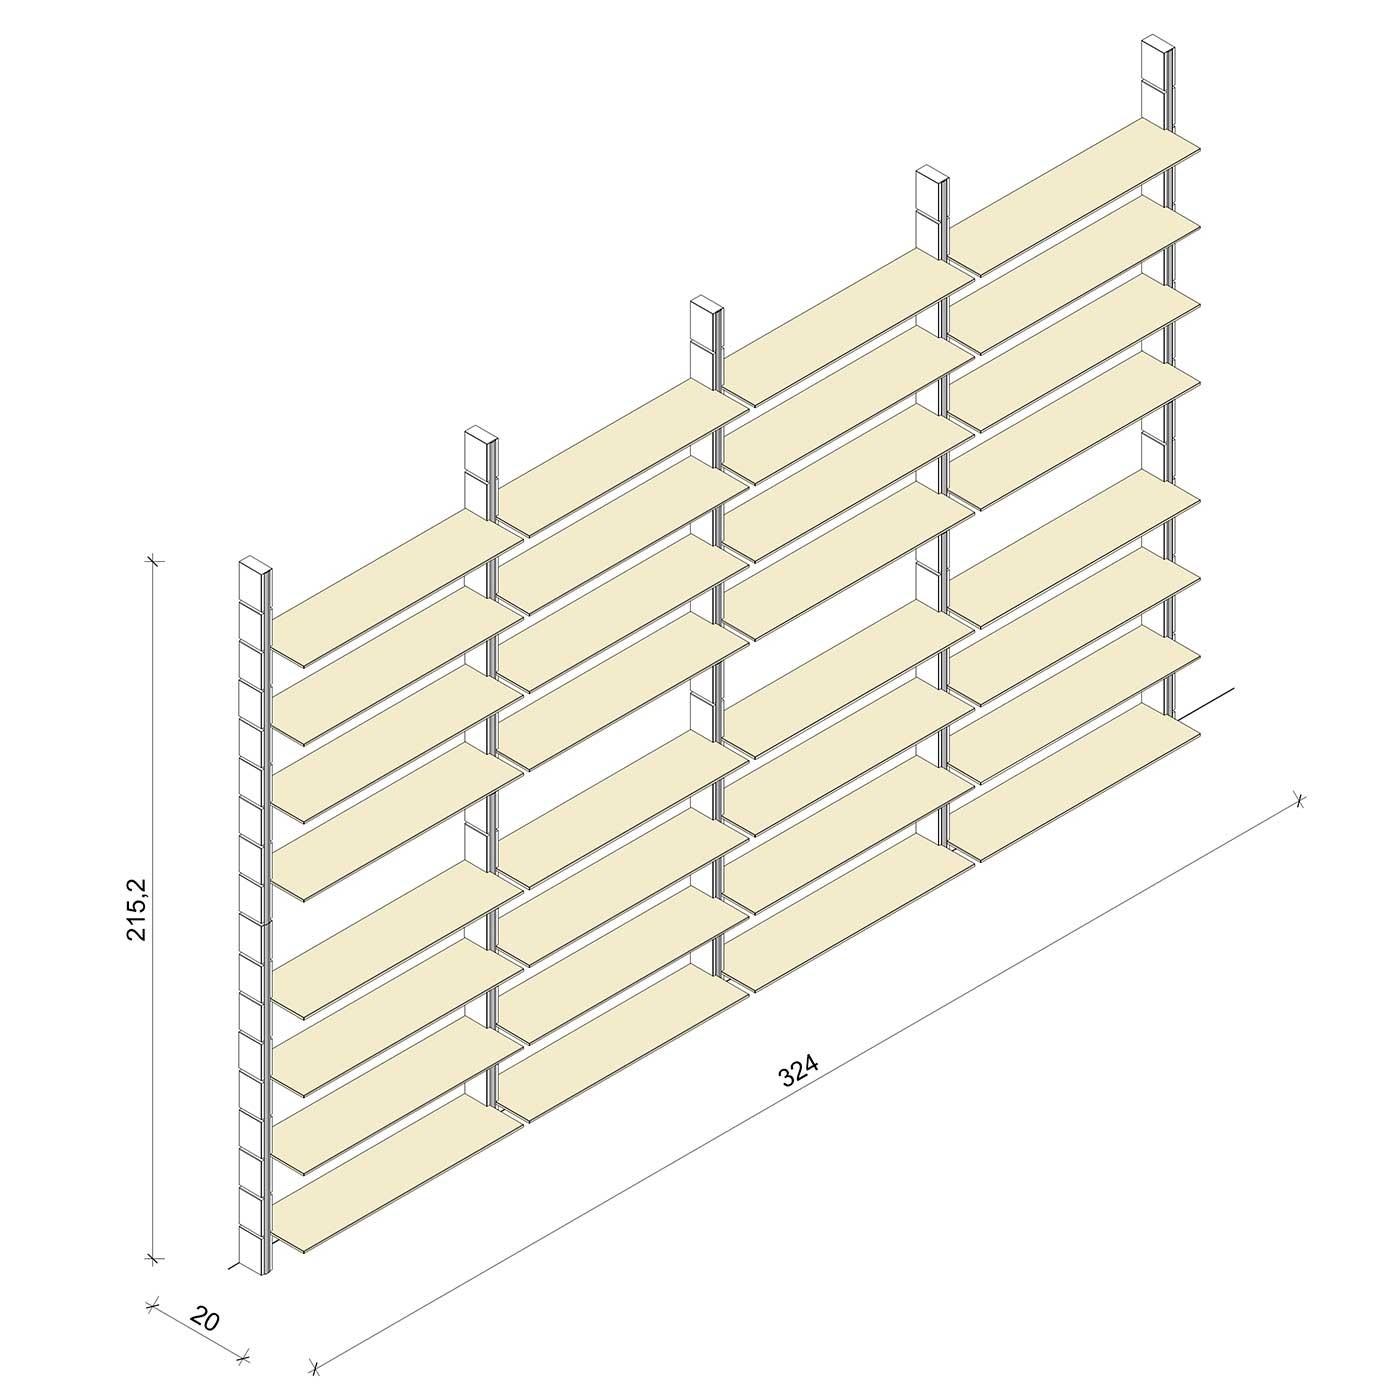 Bücherregal - Classic (XL) 324 - Maß: 324 x 215,2 x 20 cm (B x H x T)